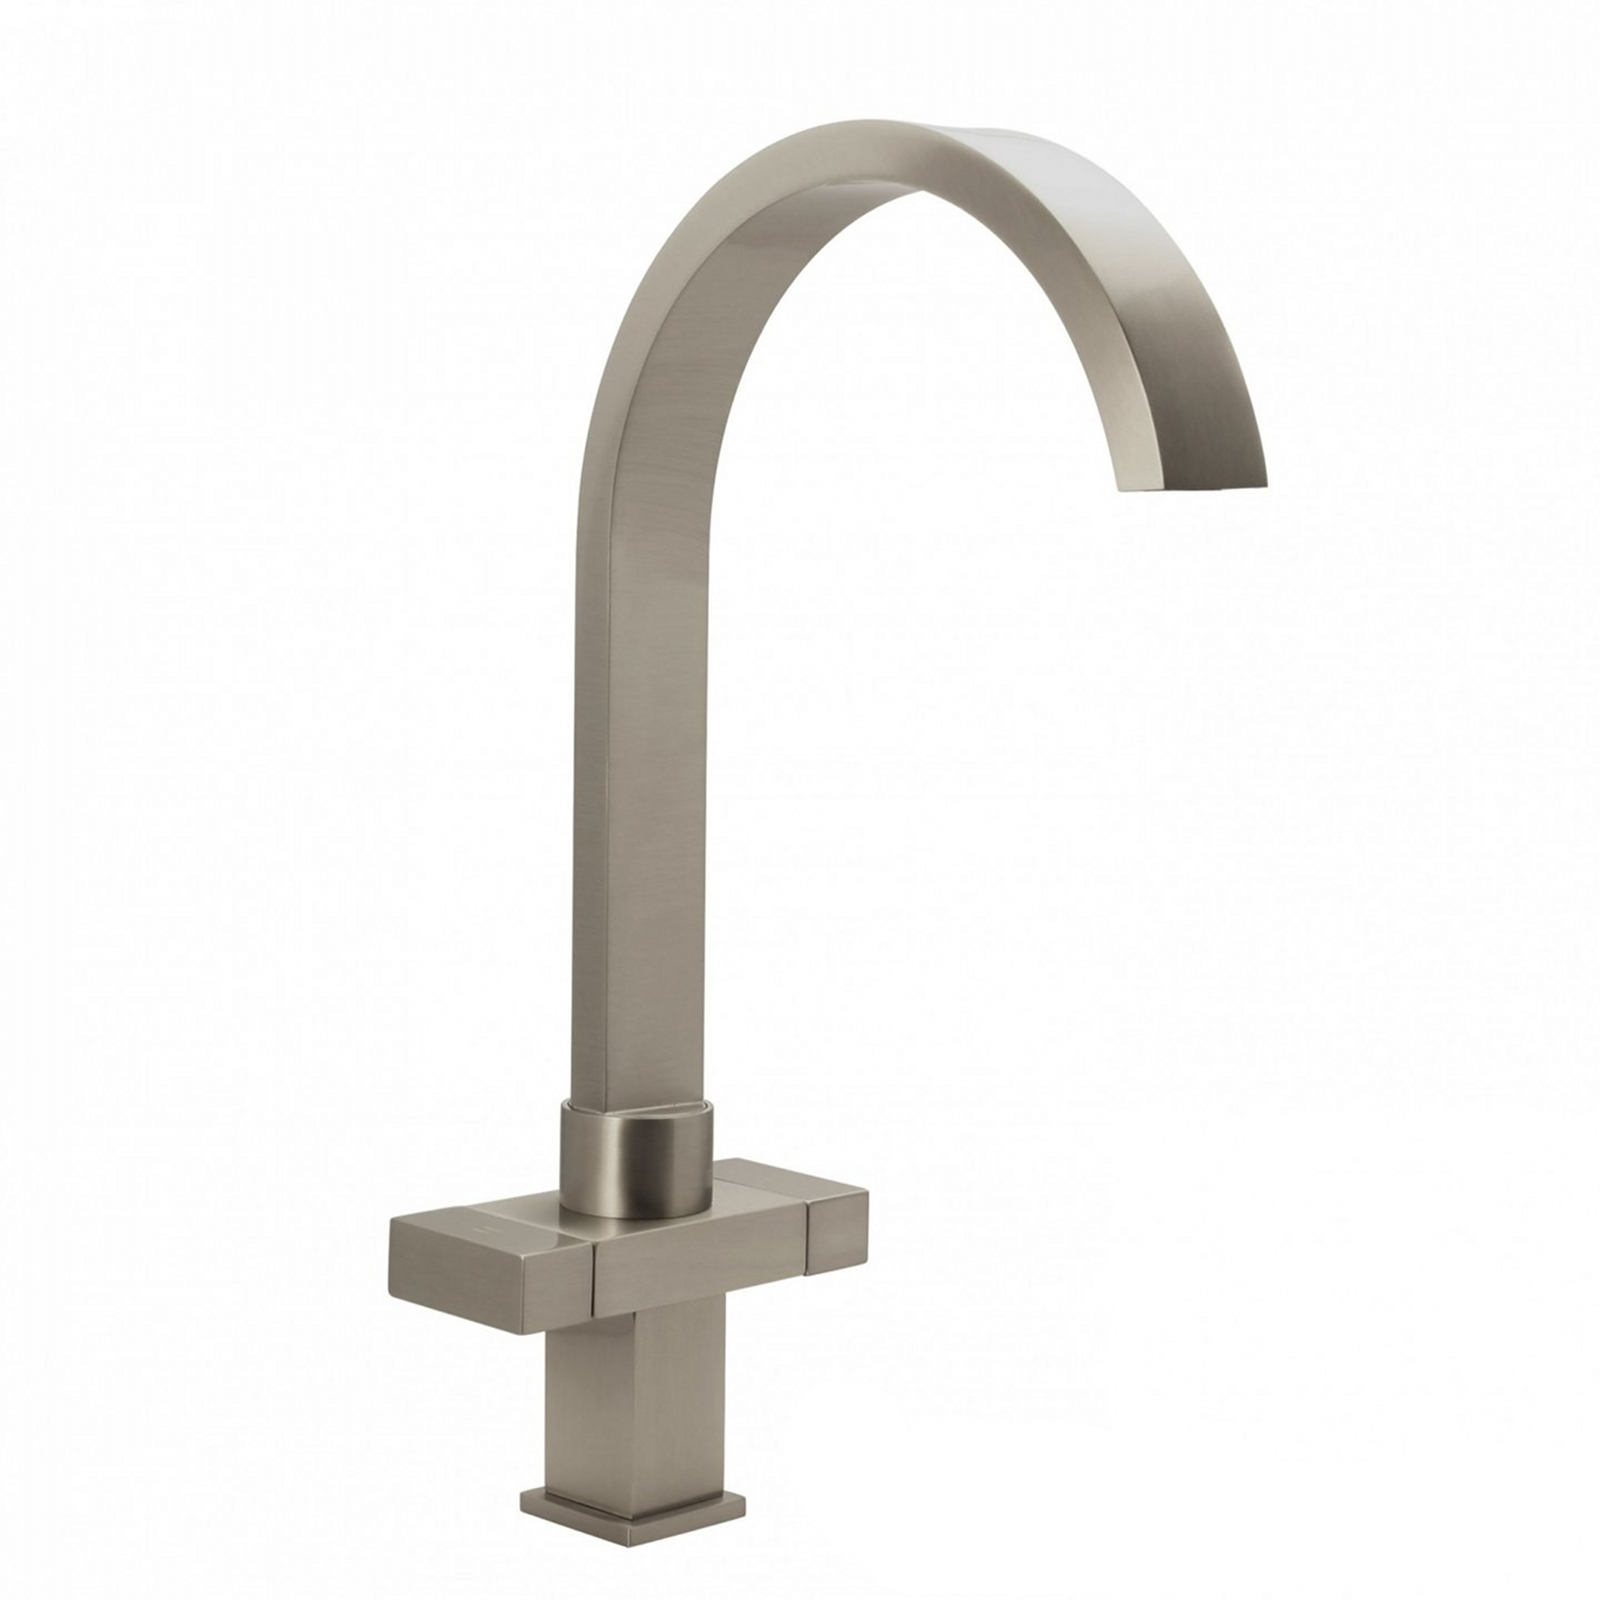 enki chrome kitchen sink mixer tap traditional black - Brushed Steel Kitchen Sinks